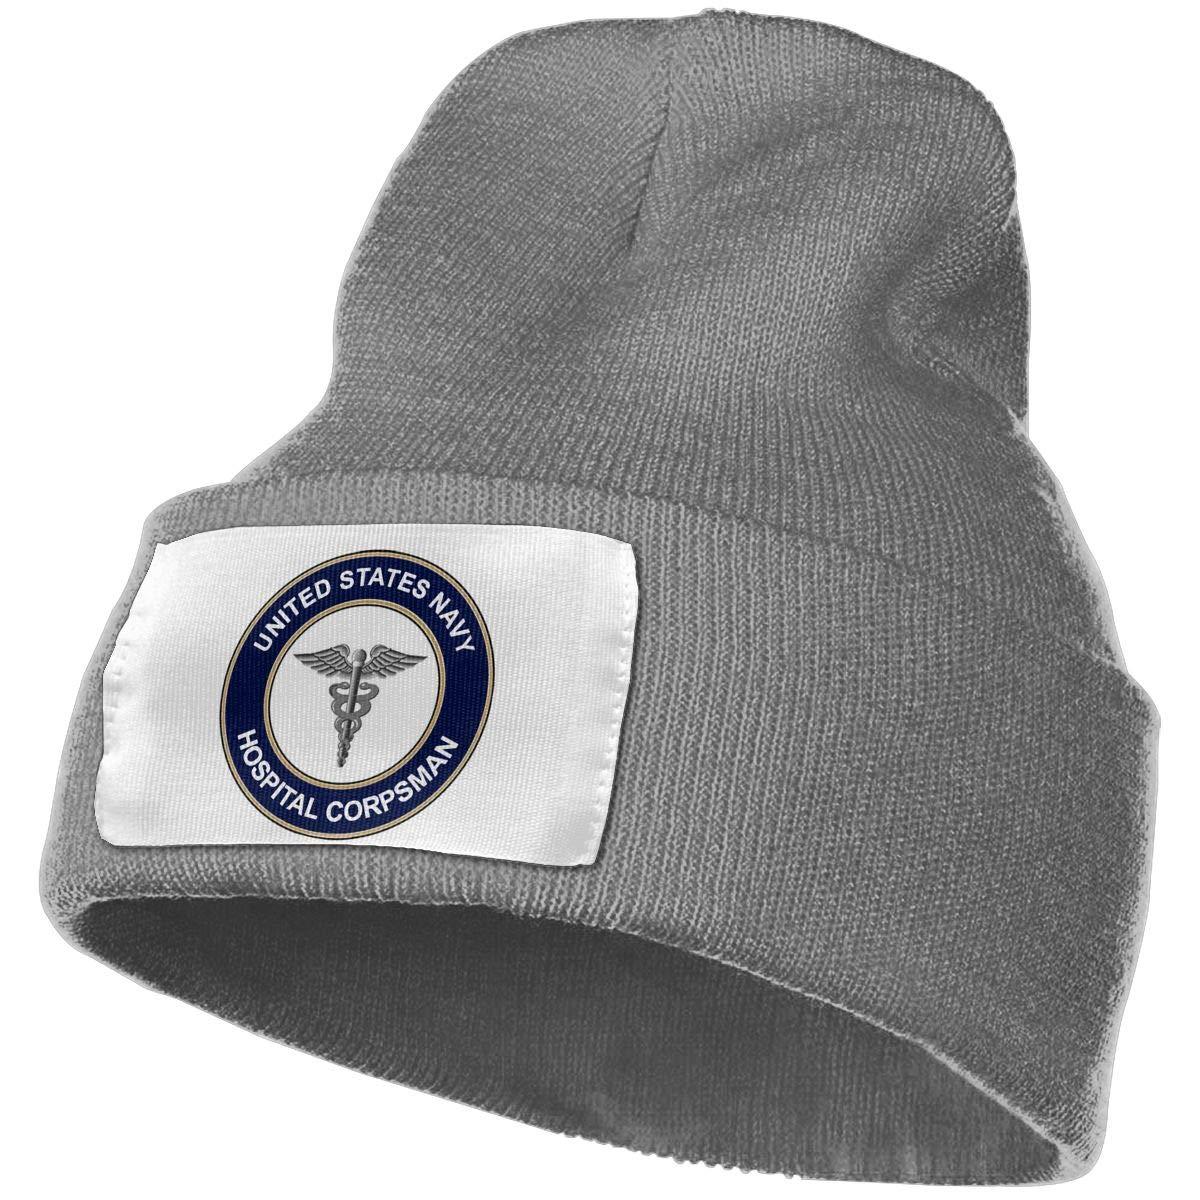 485e9e62a3fee5 Unisex Winter Hats US Navy Hospital Corpsman Skull Caps Knit Hat Cap Beanie  Cap for Men/Womens at Amazon Men's Clothing store: